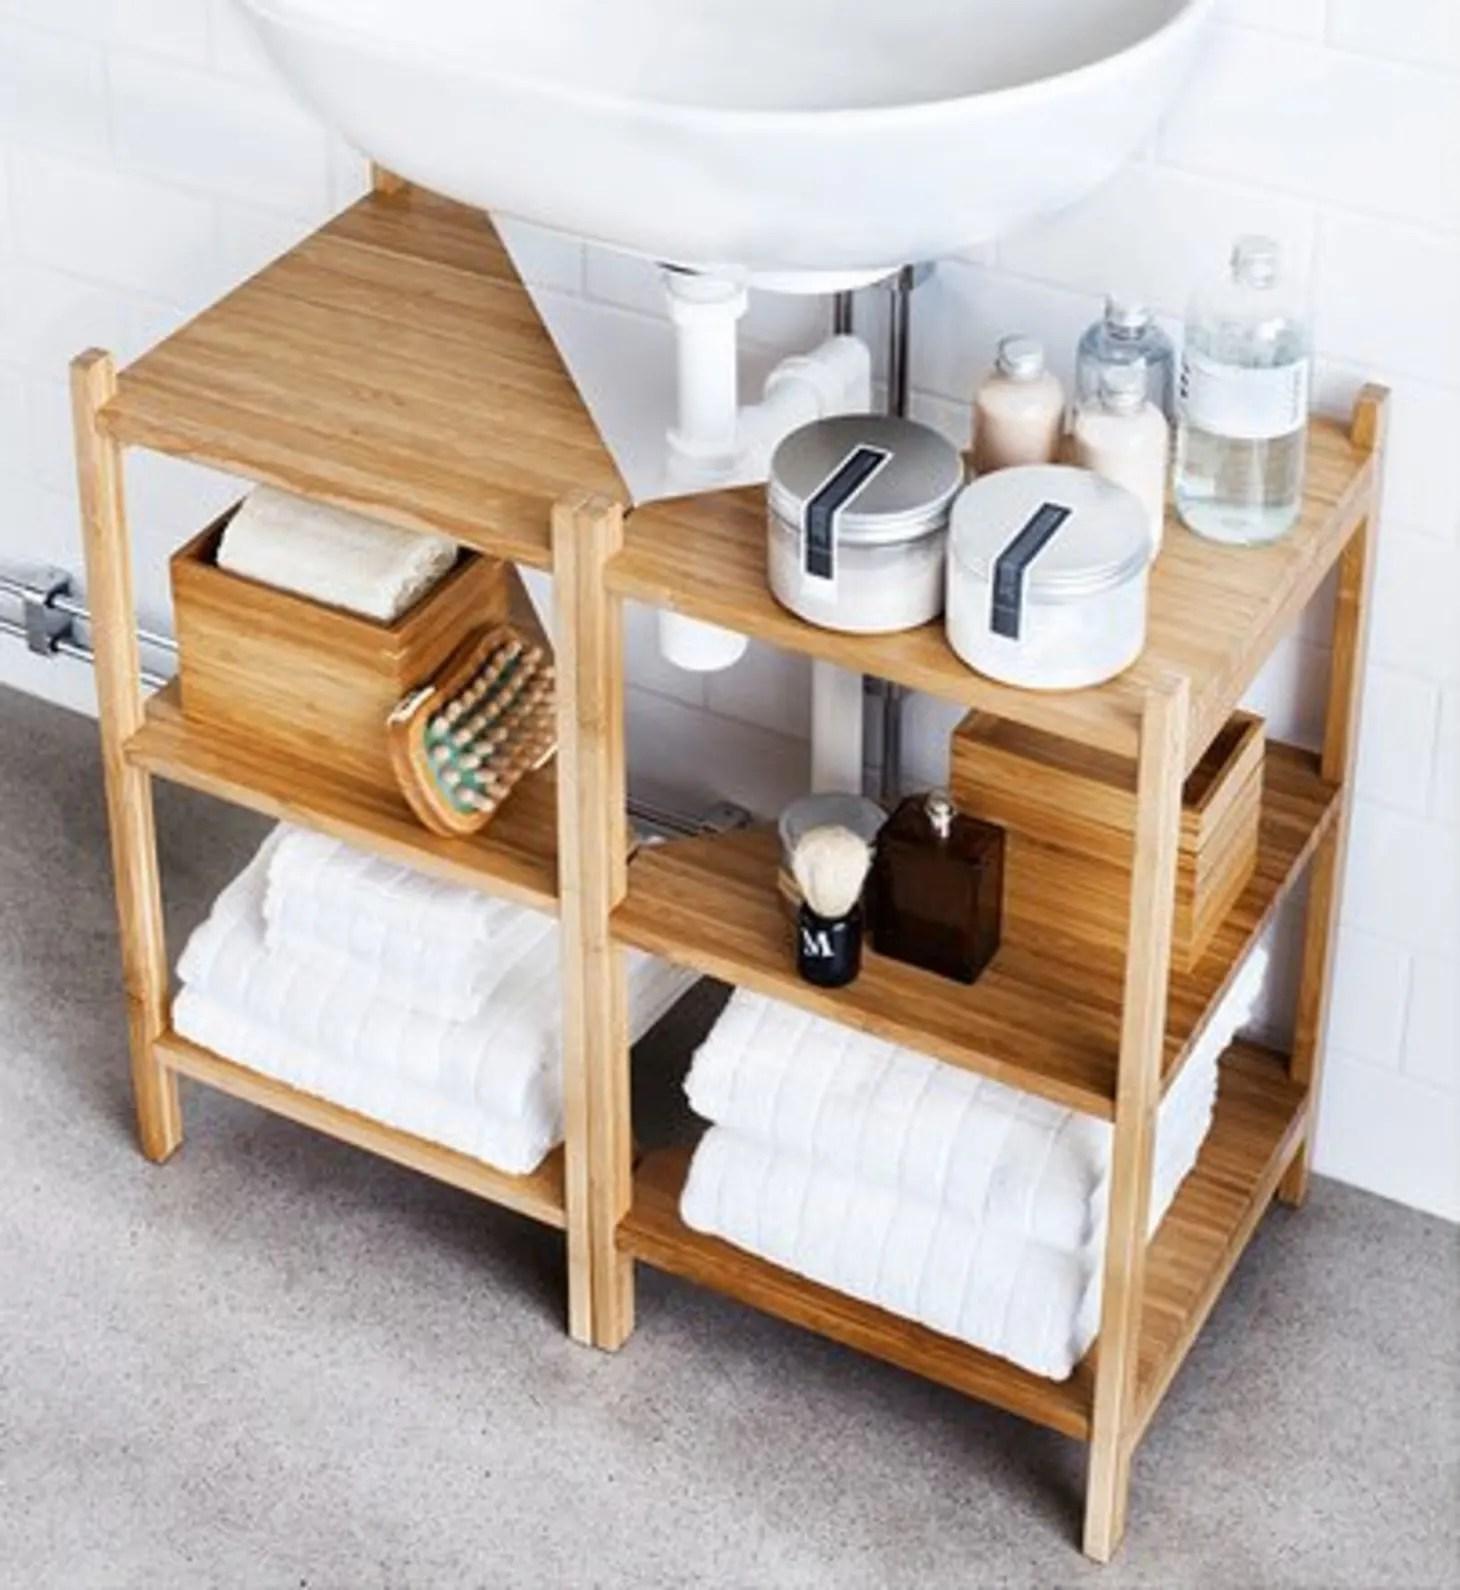 Bathroom Storage Ideas - Storage For Small Bathrooms ... on Small Apartment Bathroom Storage Ideas  id=62064